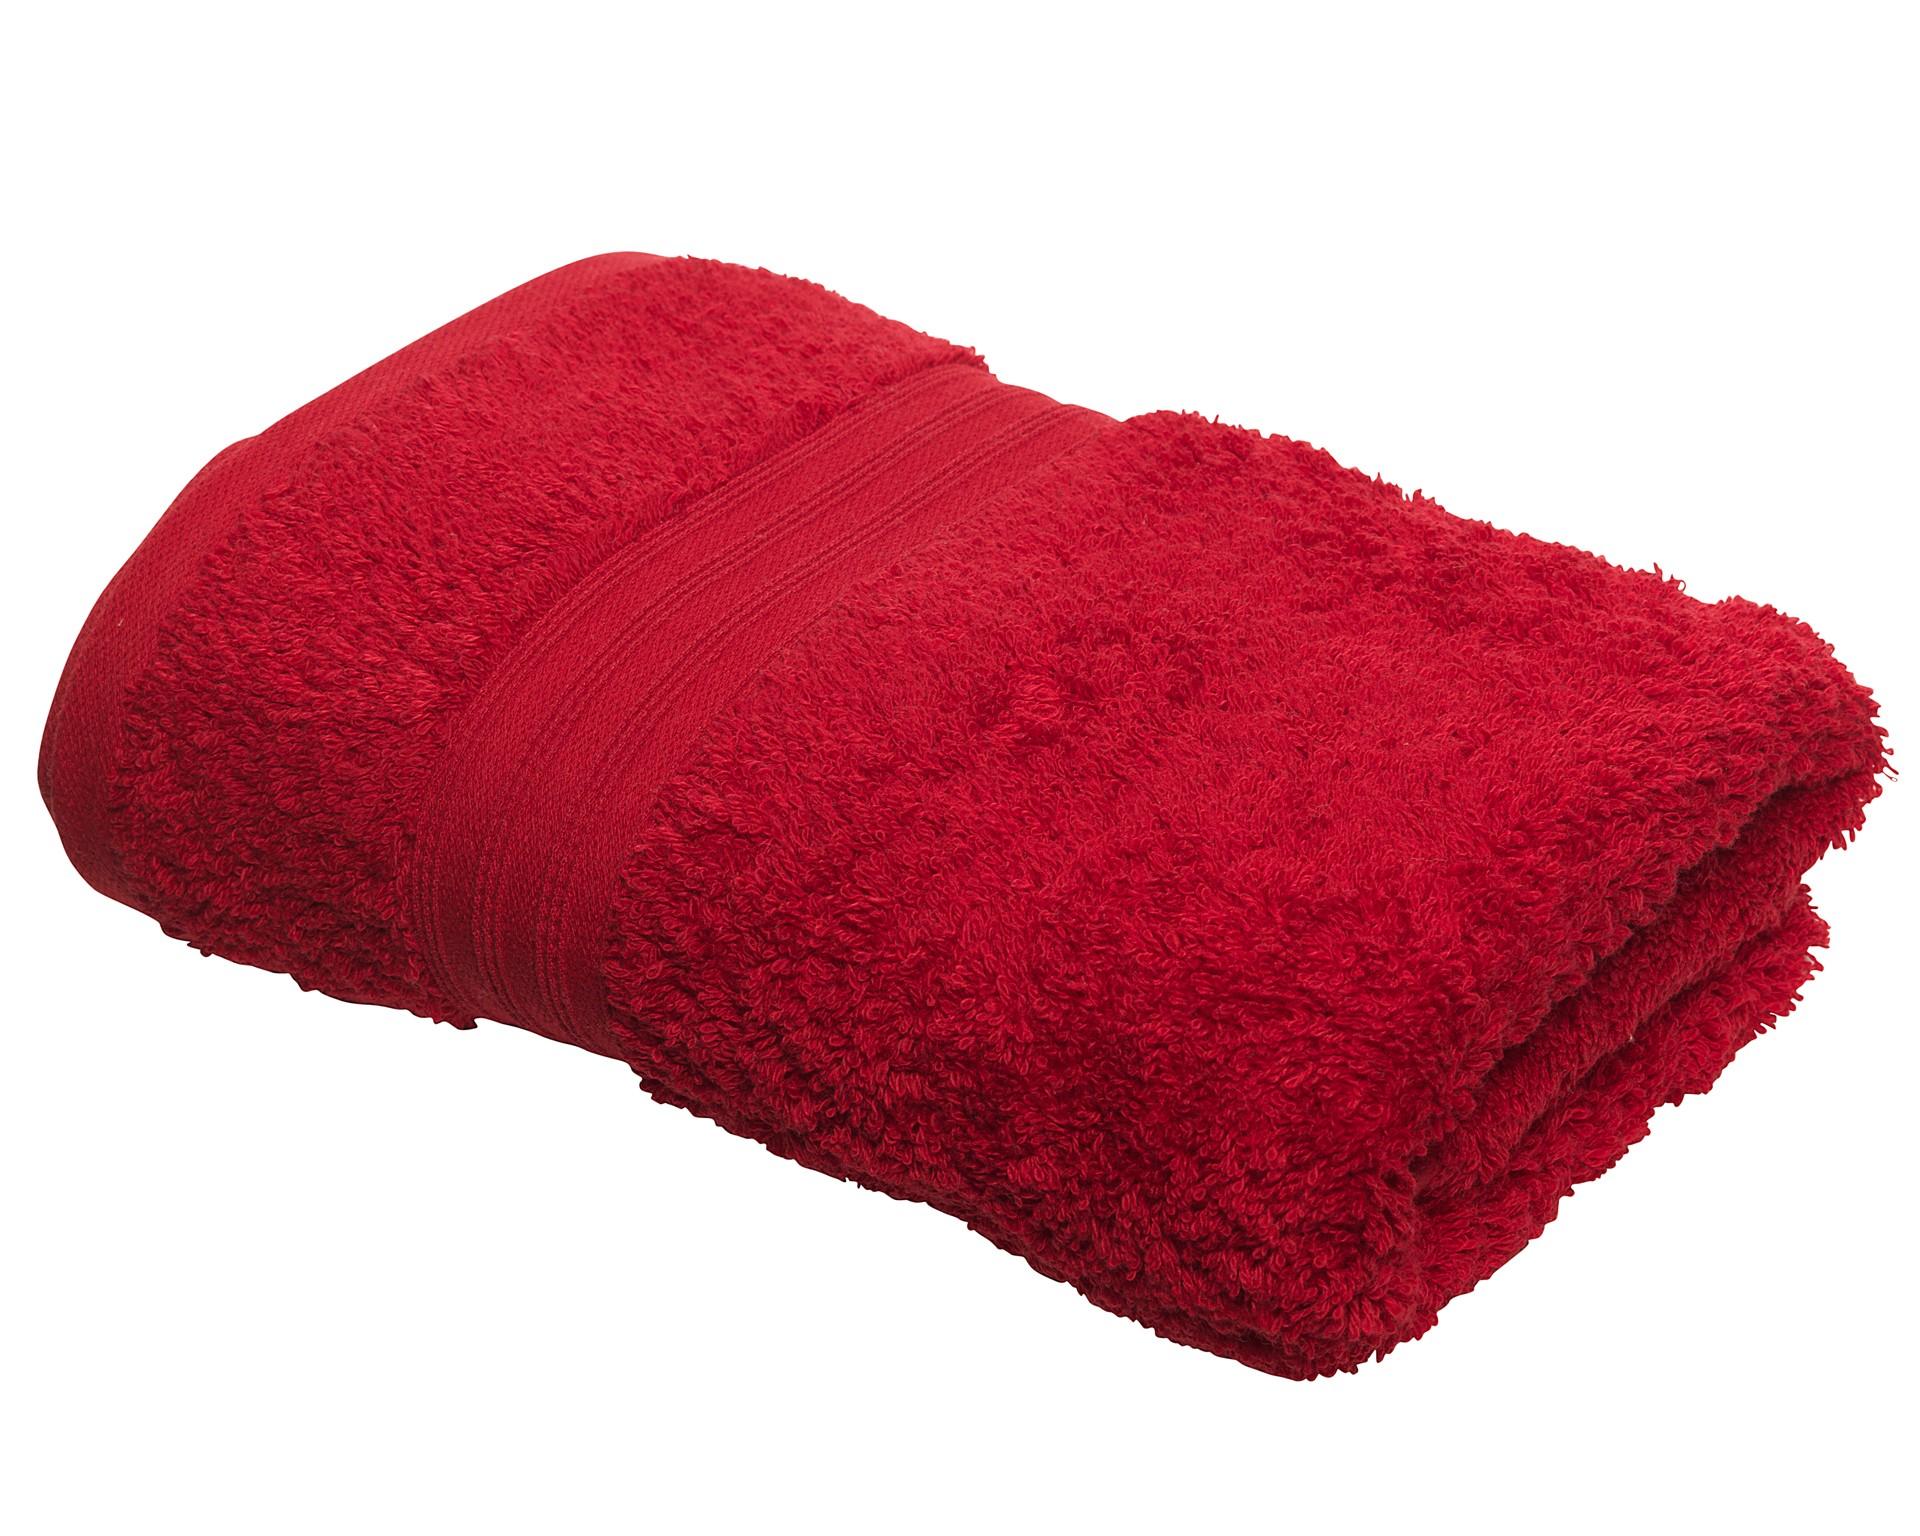 Handtuch KRONBORG® Elegance (50x100, bordeaux)